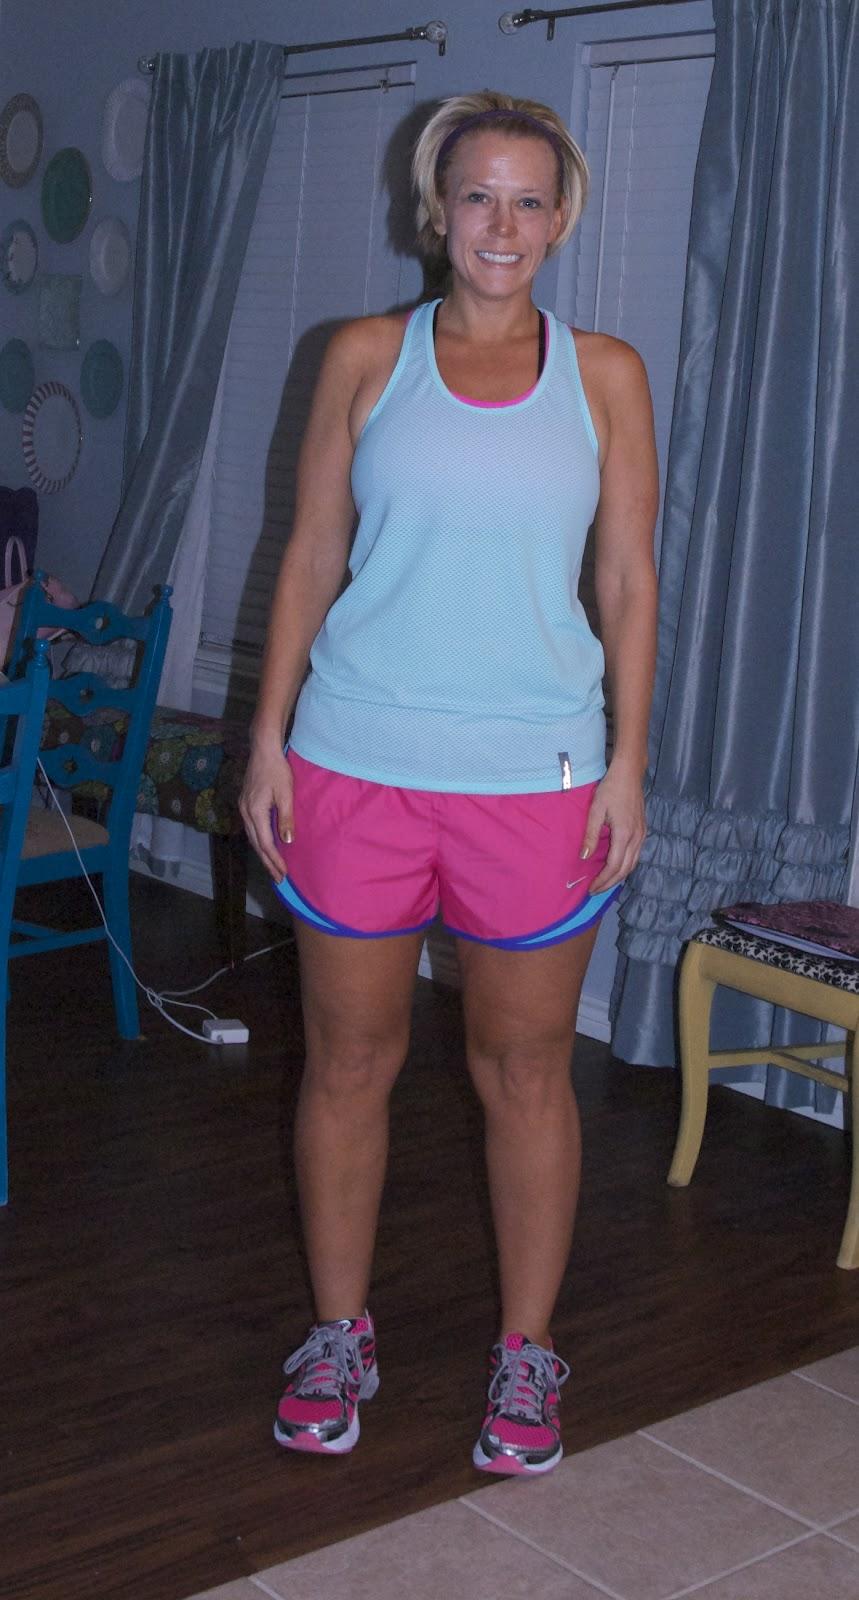 Skinny Meg 10 Mile Race Recap